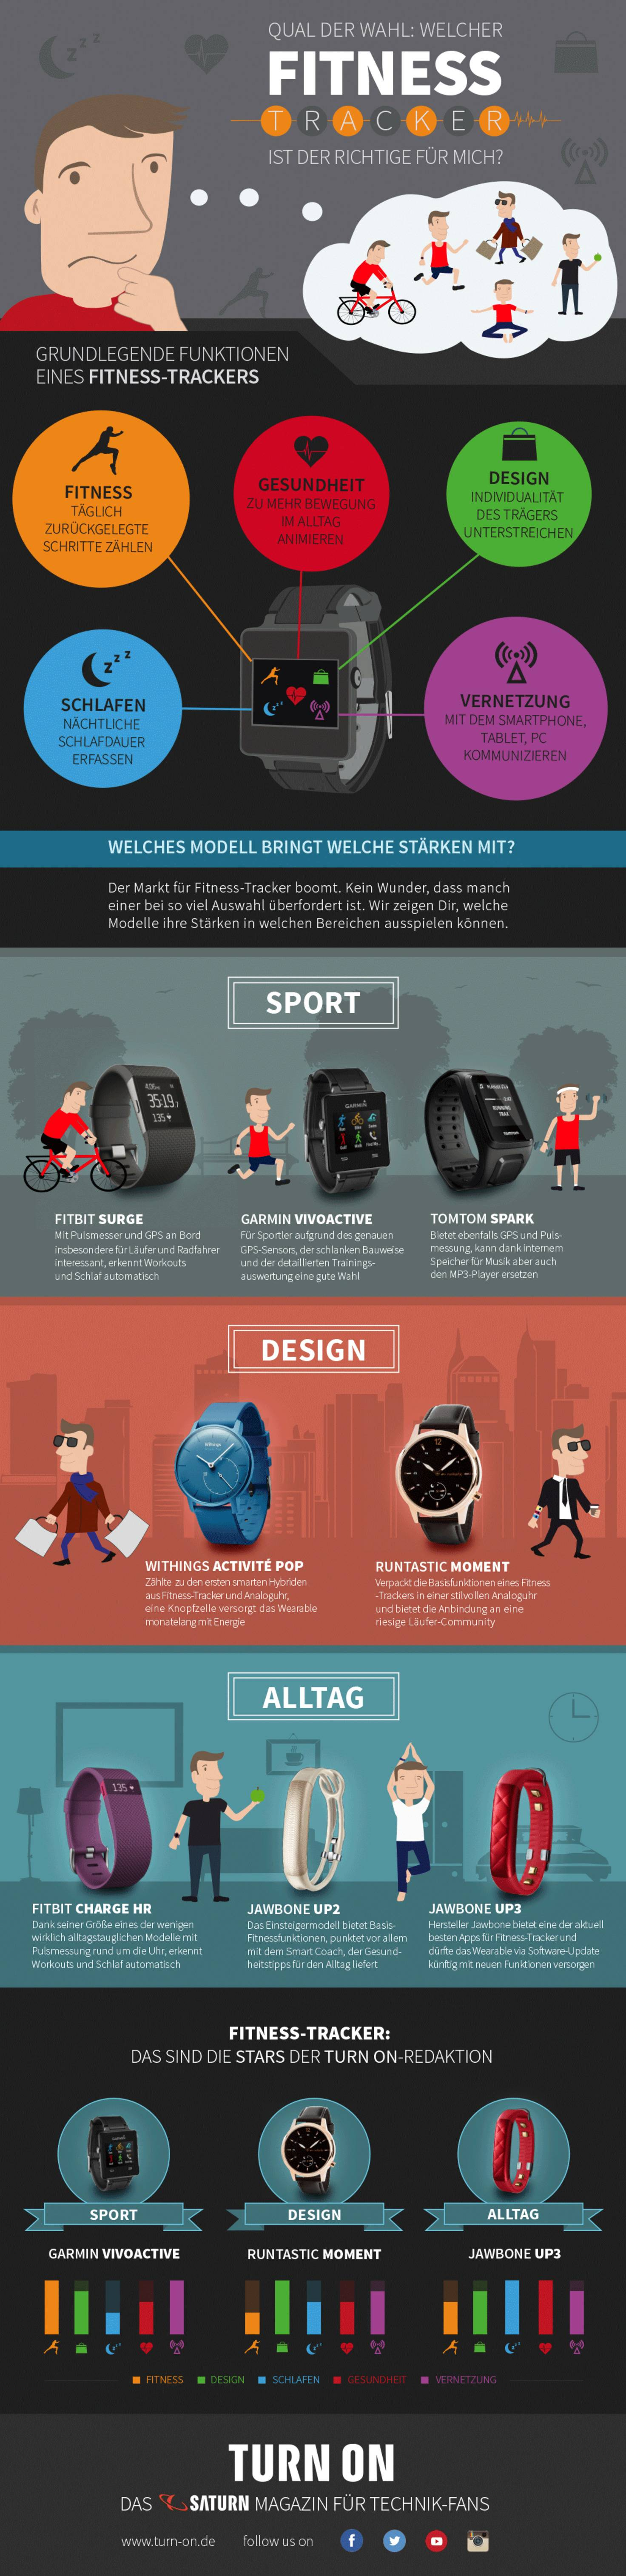 Fitness-Tracker-Grafik-PNG